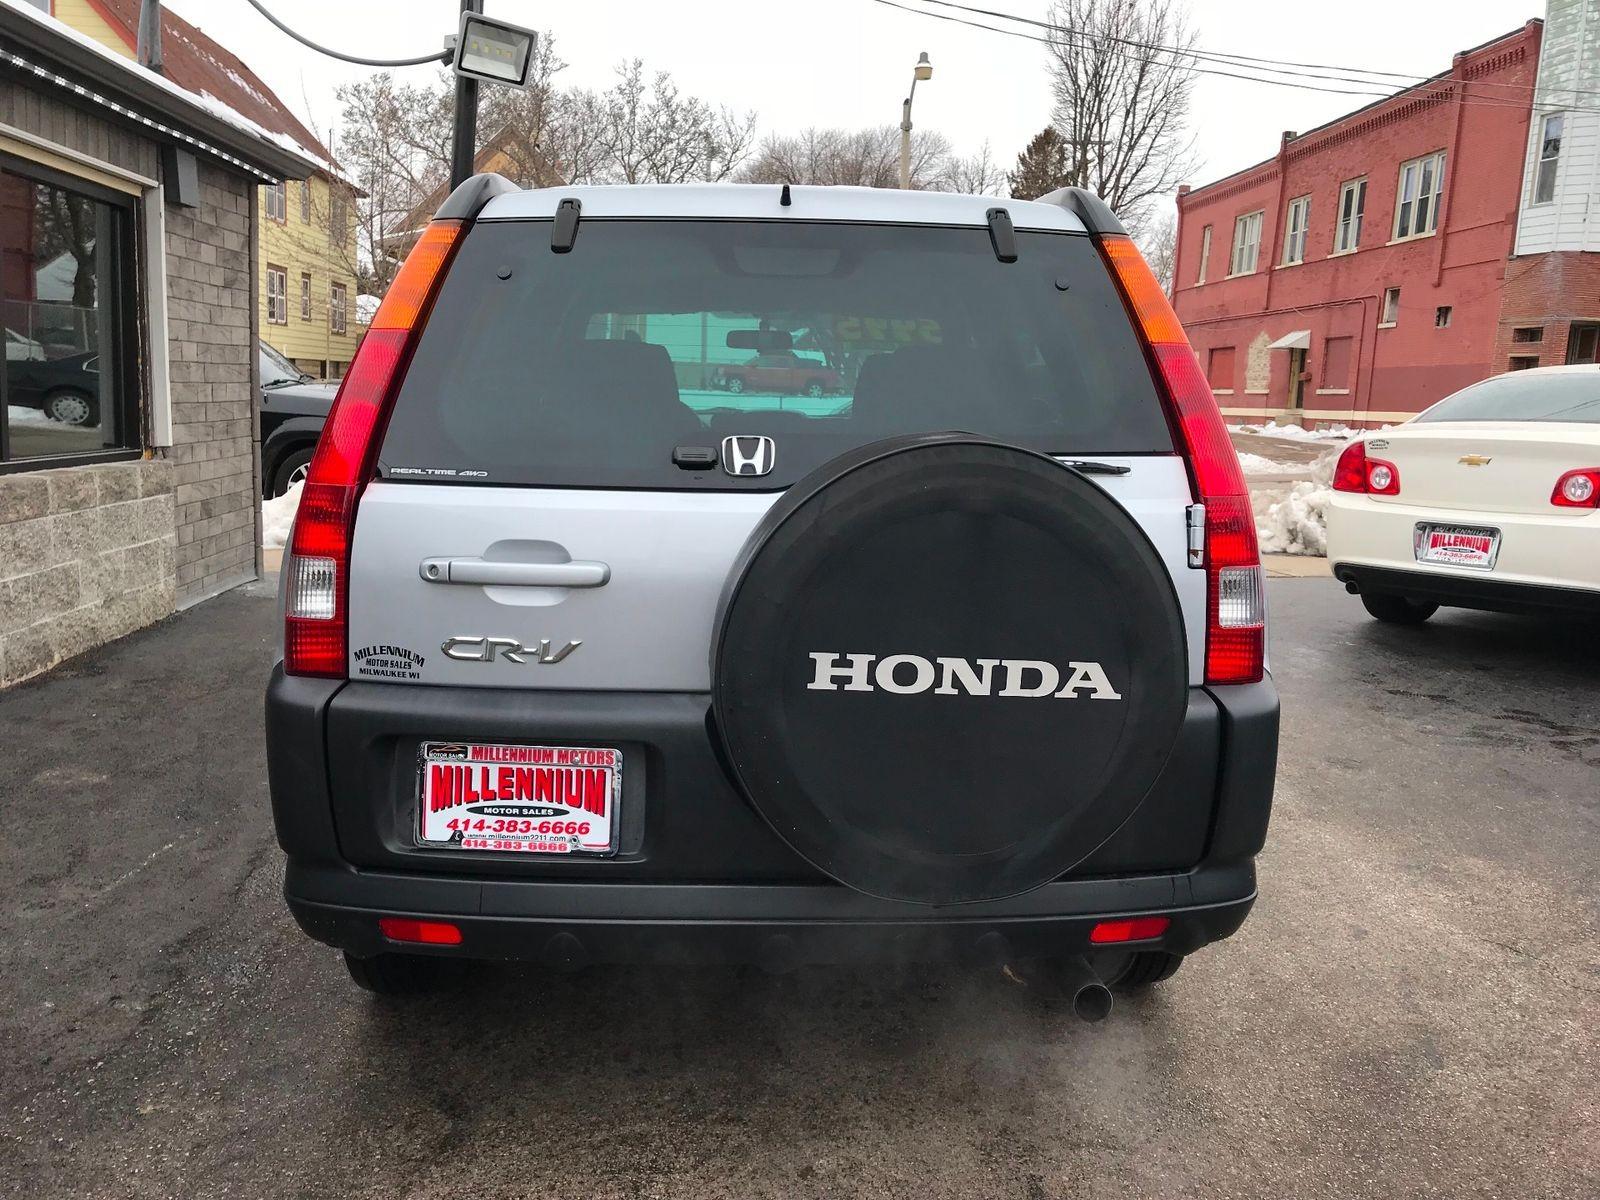 2003 Honda Crv Parts Diagram 2003 Honda Cr V Ex City Wisconsin Millennium Motor Sales Of 2003 Honda Crv Parts Diagram